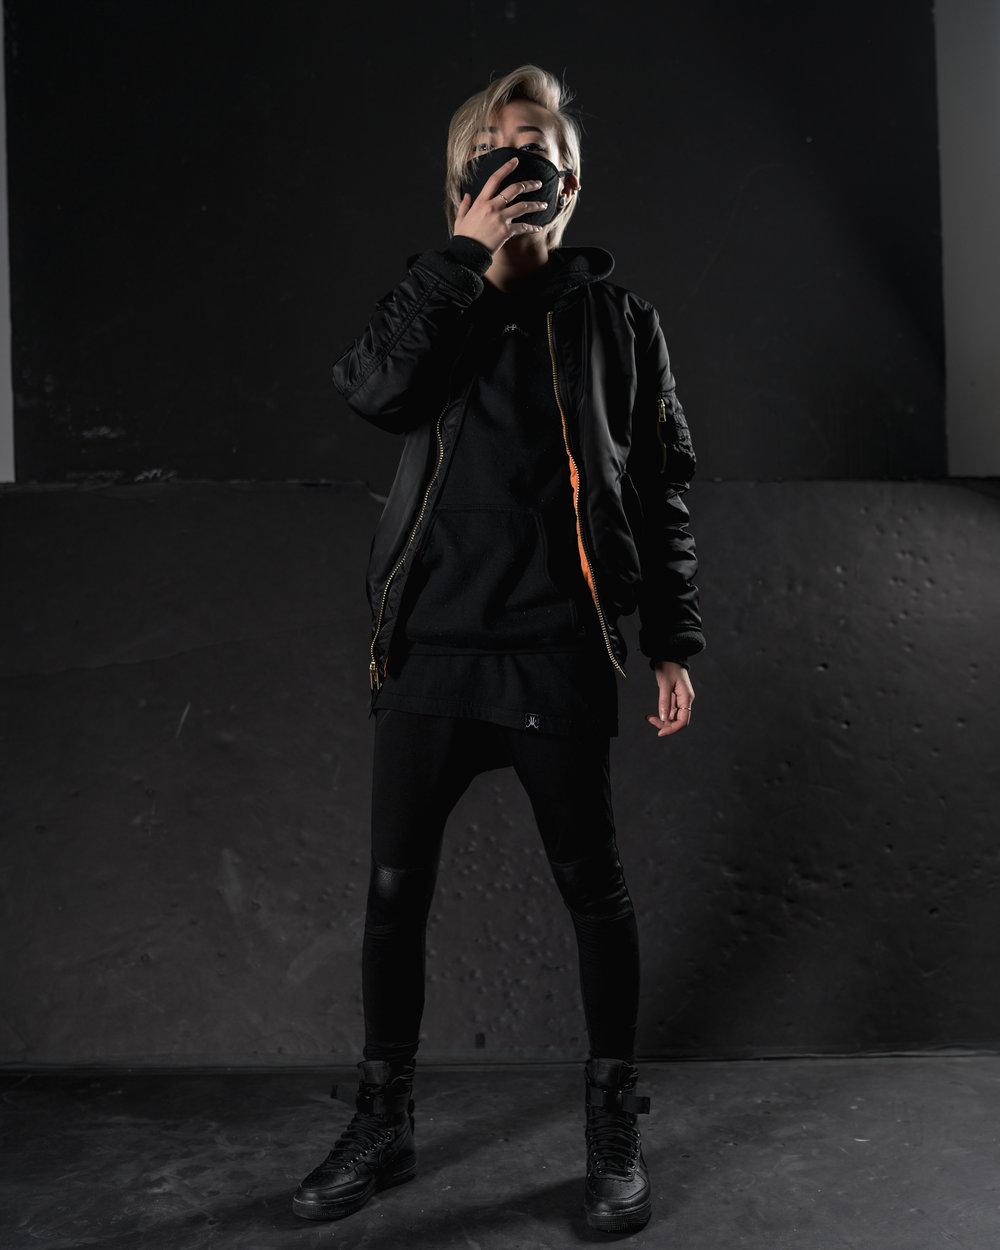 LV - Toronto - Cody Haze - 1.JPG